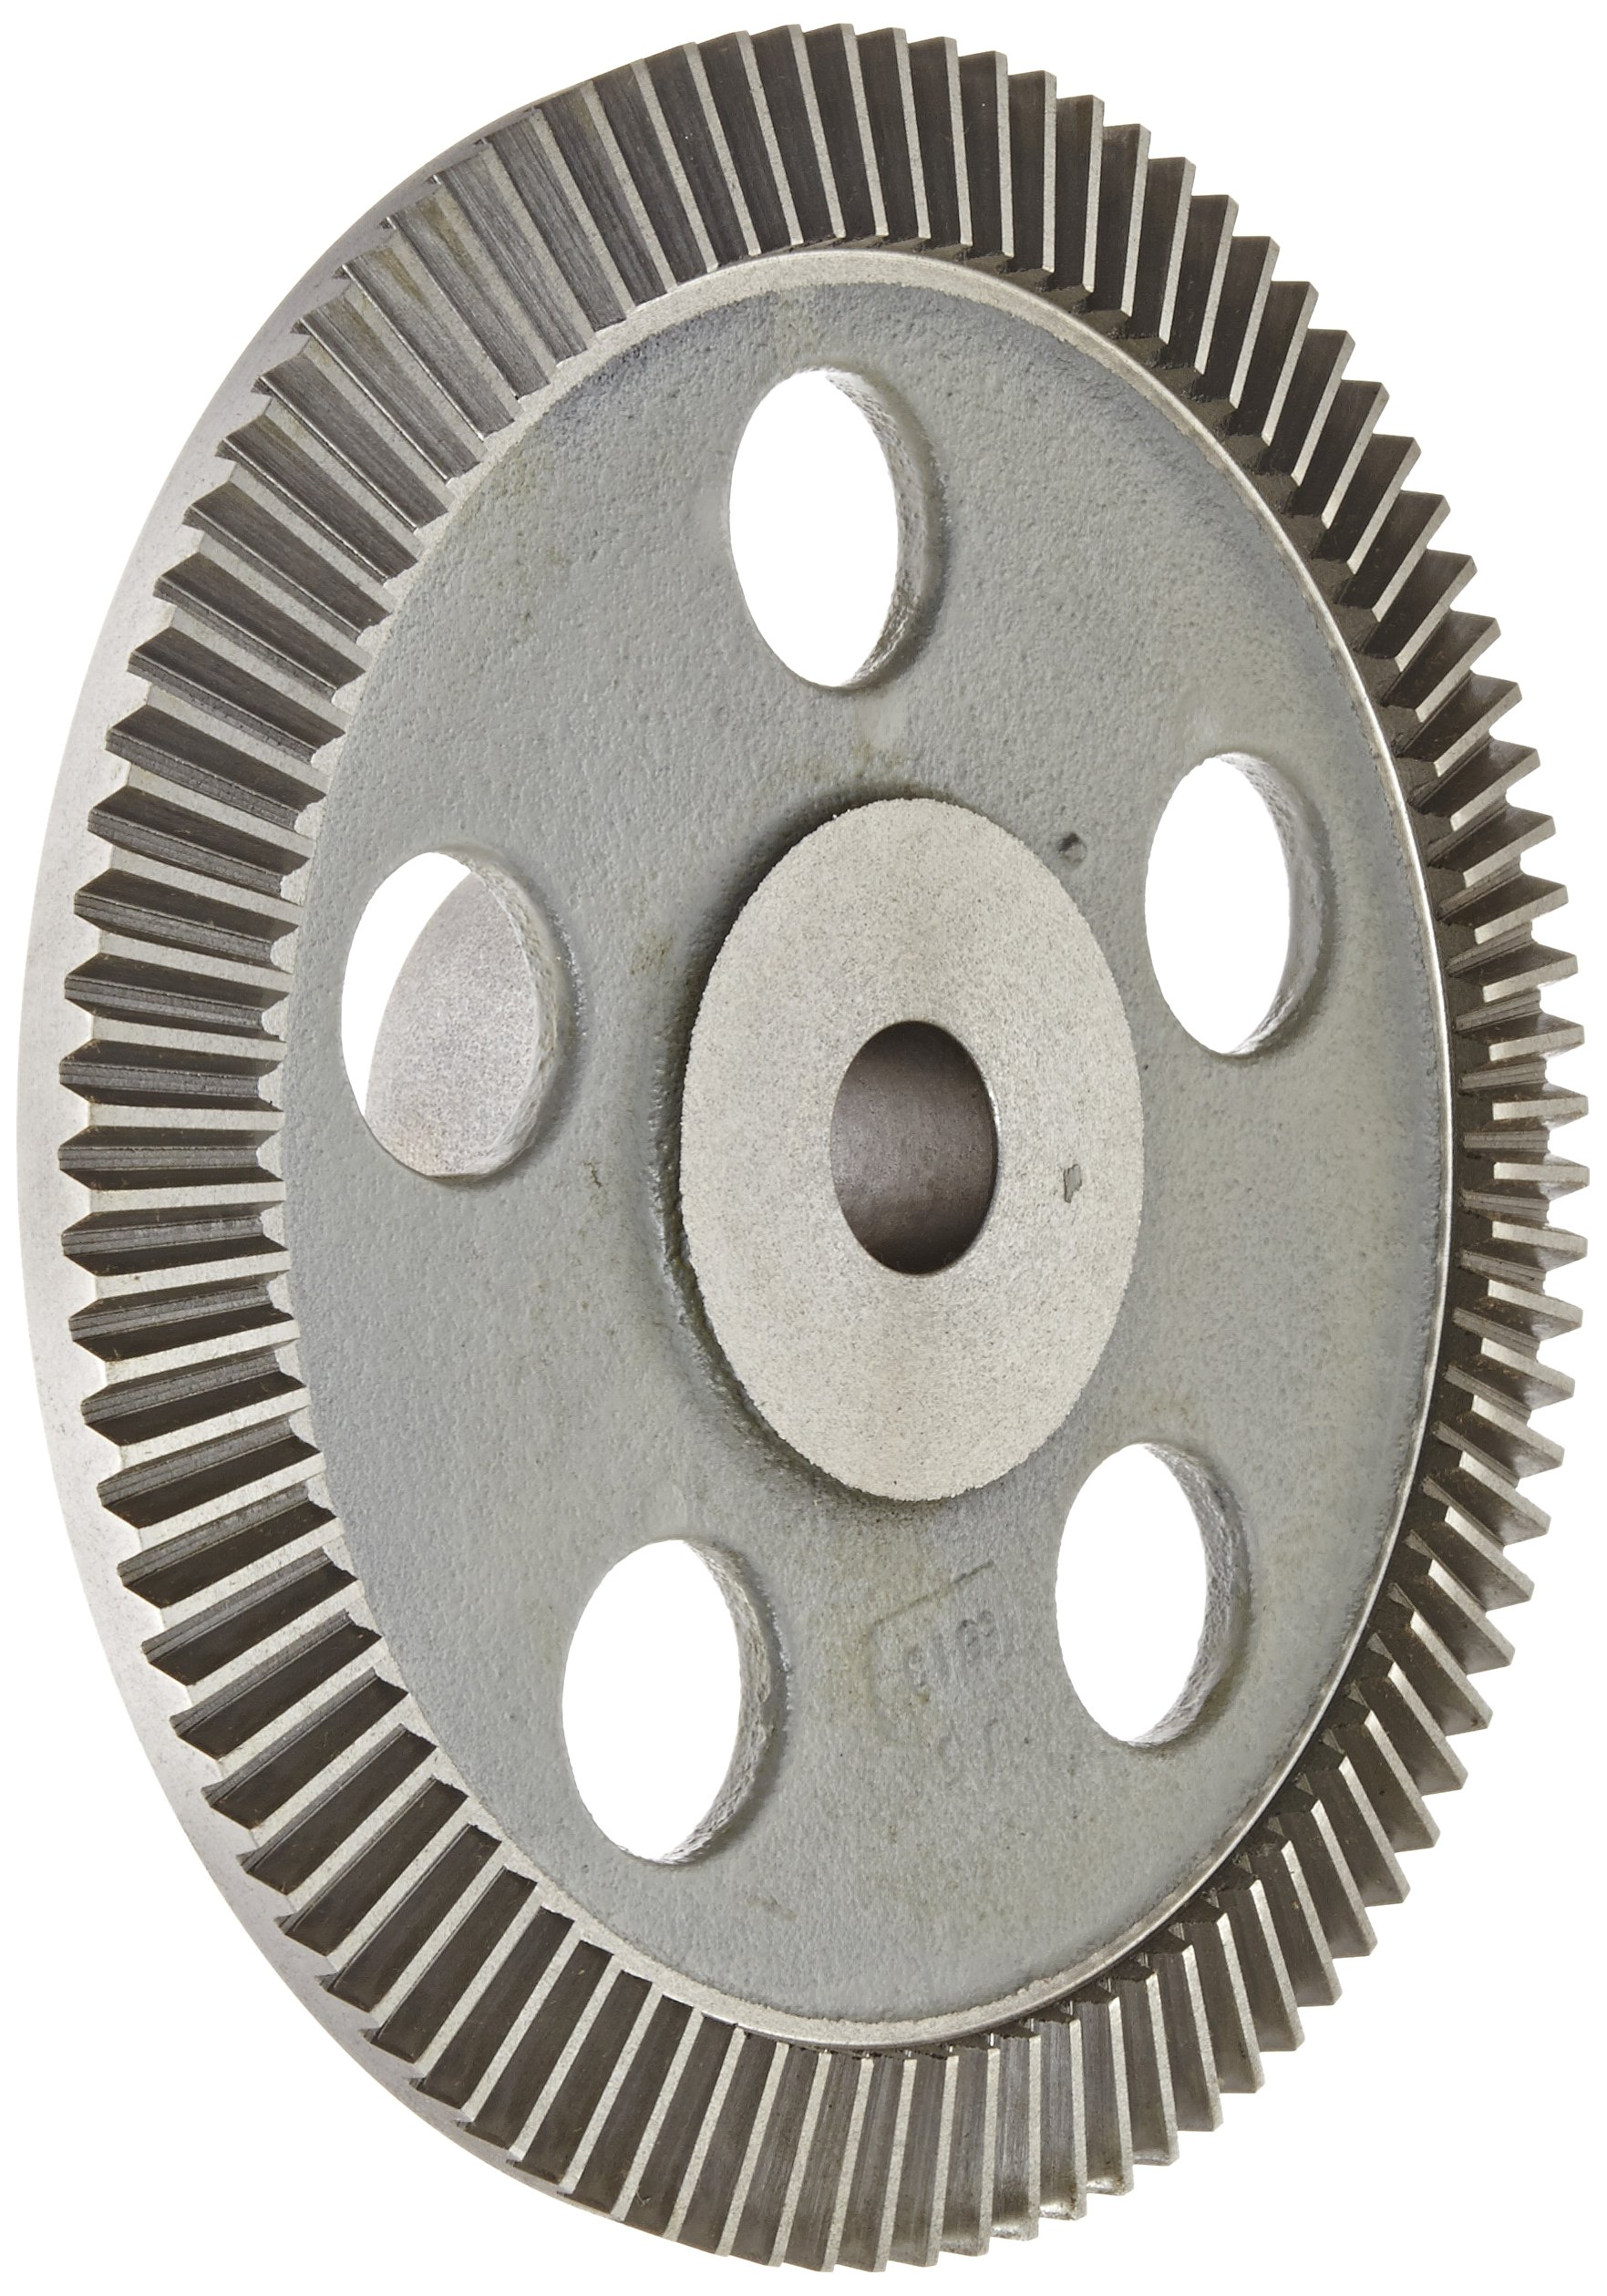 "Boston Gear PA9610Y-G Bevel Gear, 6:1 Ratio, 1.000"" Bore, 10 Pitch, 90 Teeth, 20 Degree Pressure Angle, Straight Bevel, Cast Iron"